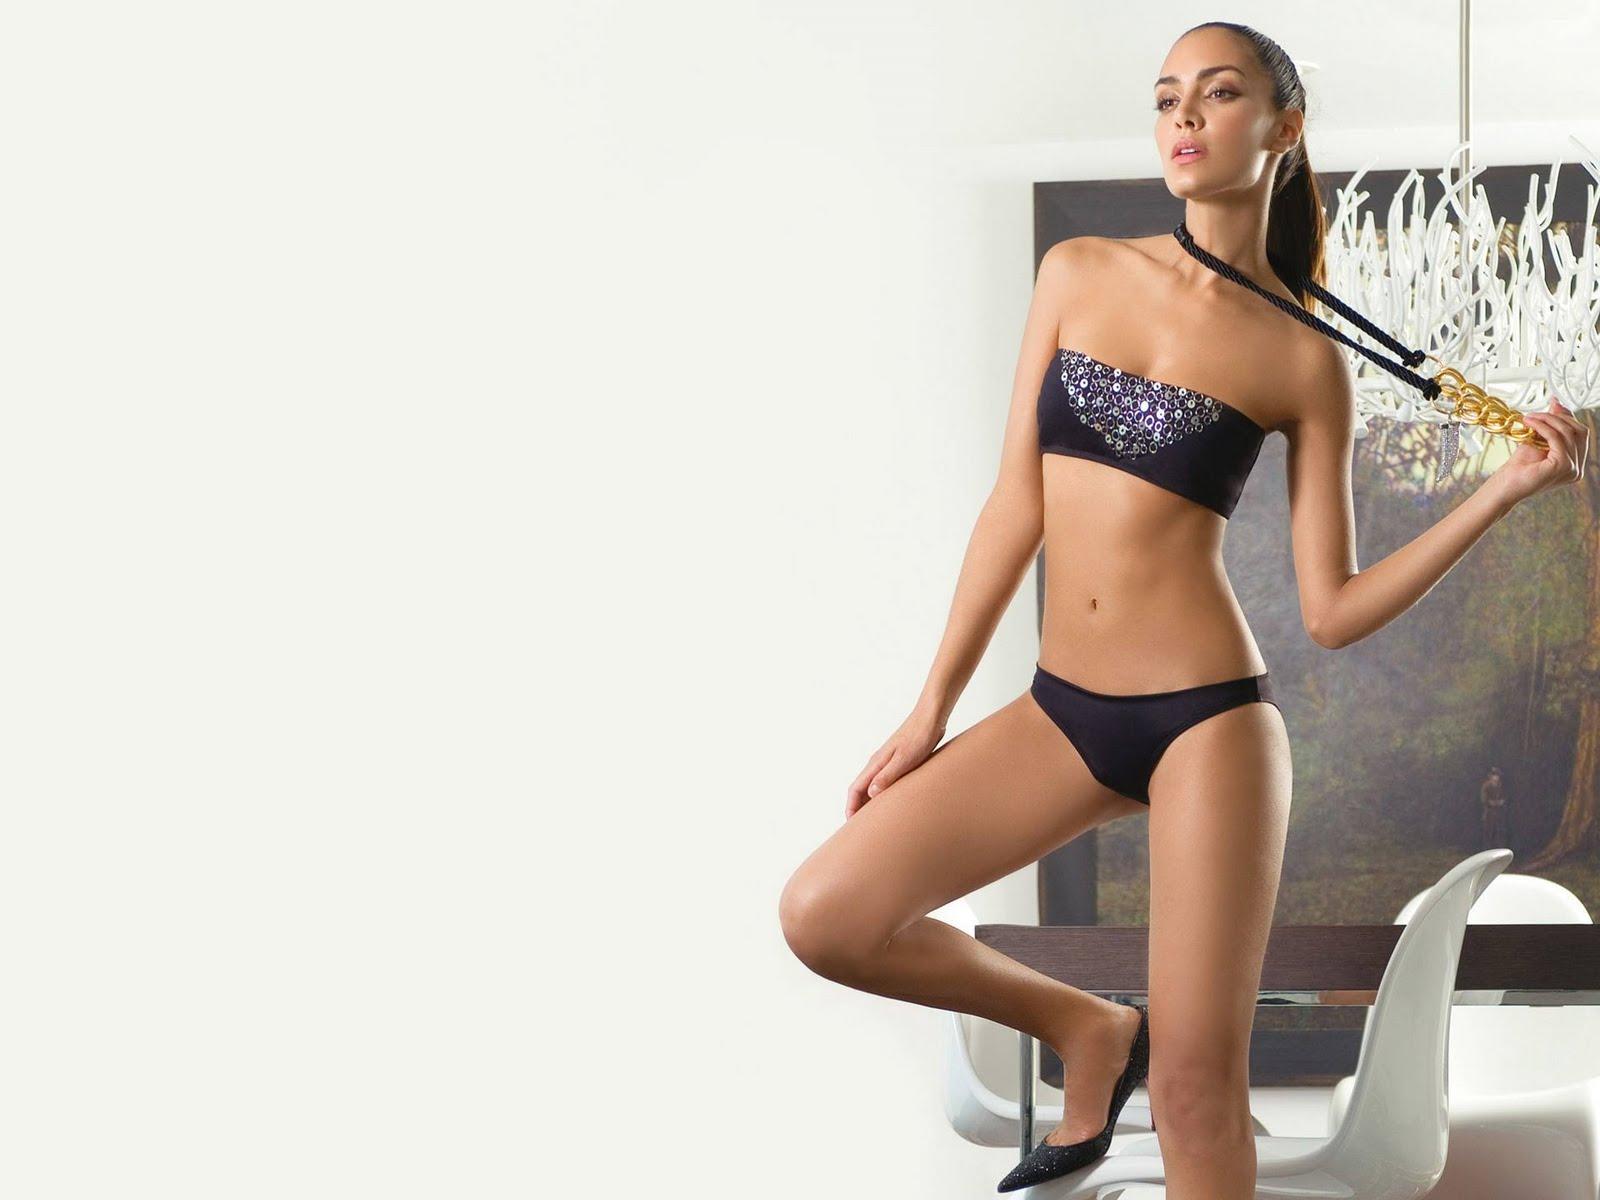 Bikini Top Models Photo Shots